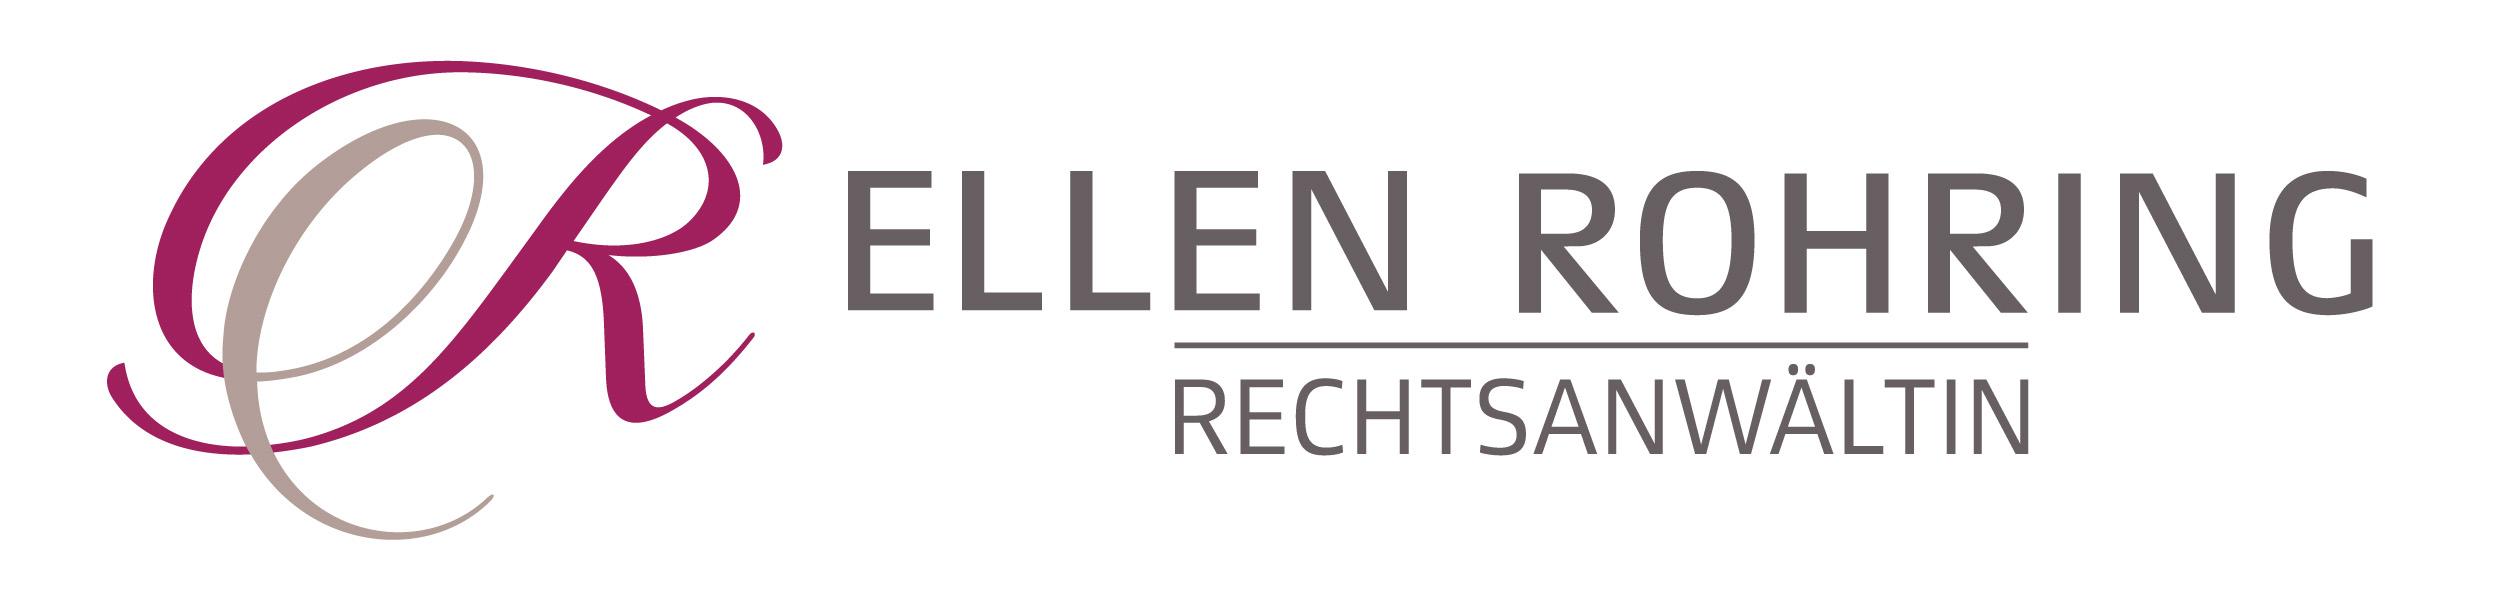 Ellen Rohring Rechtsanwältin